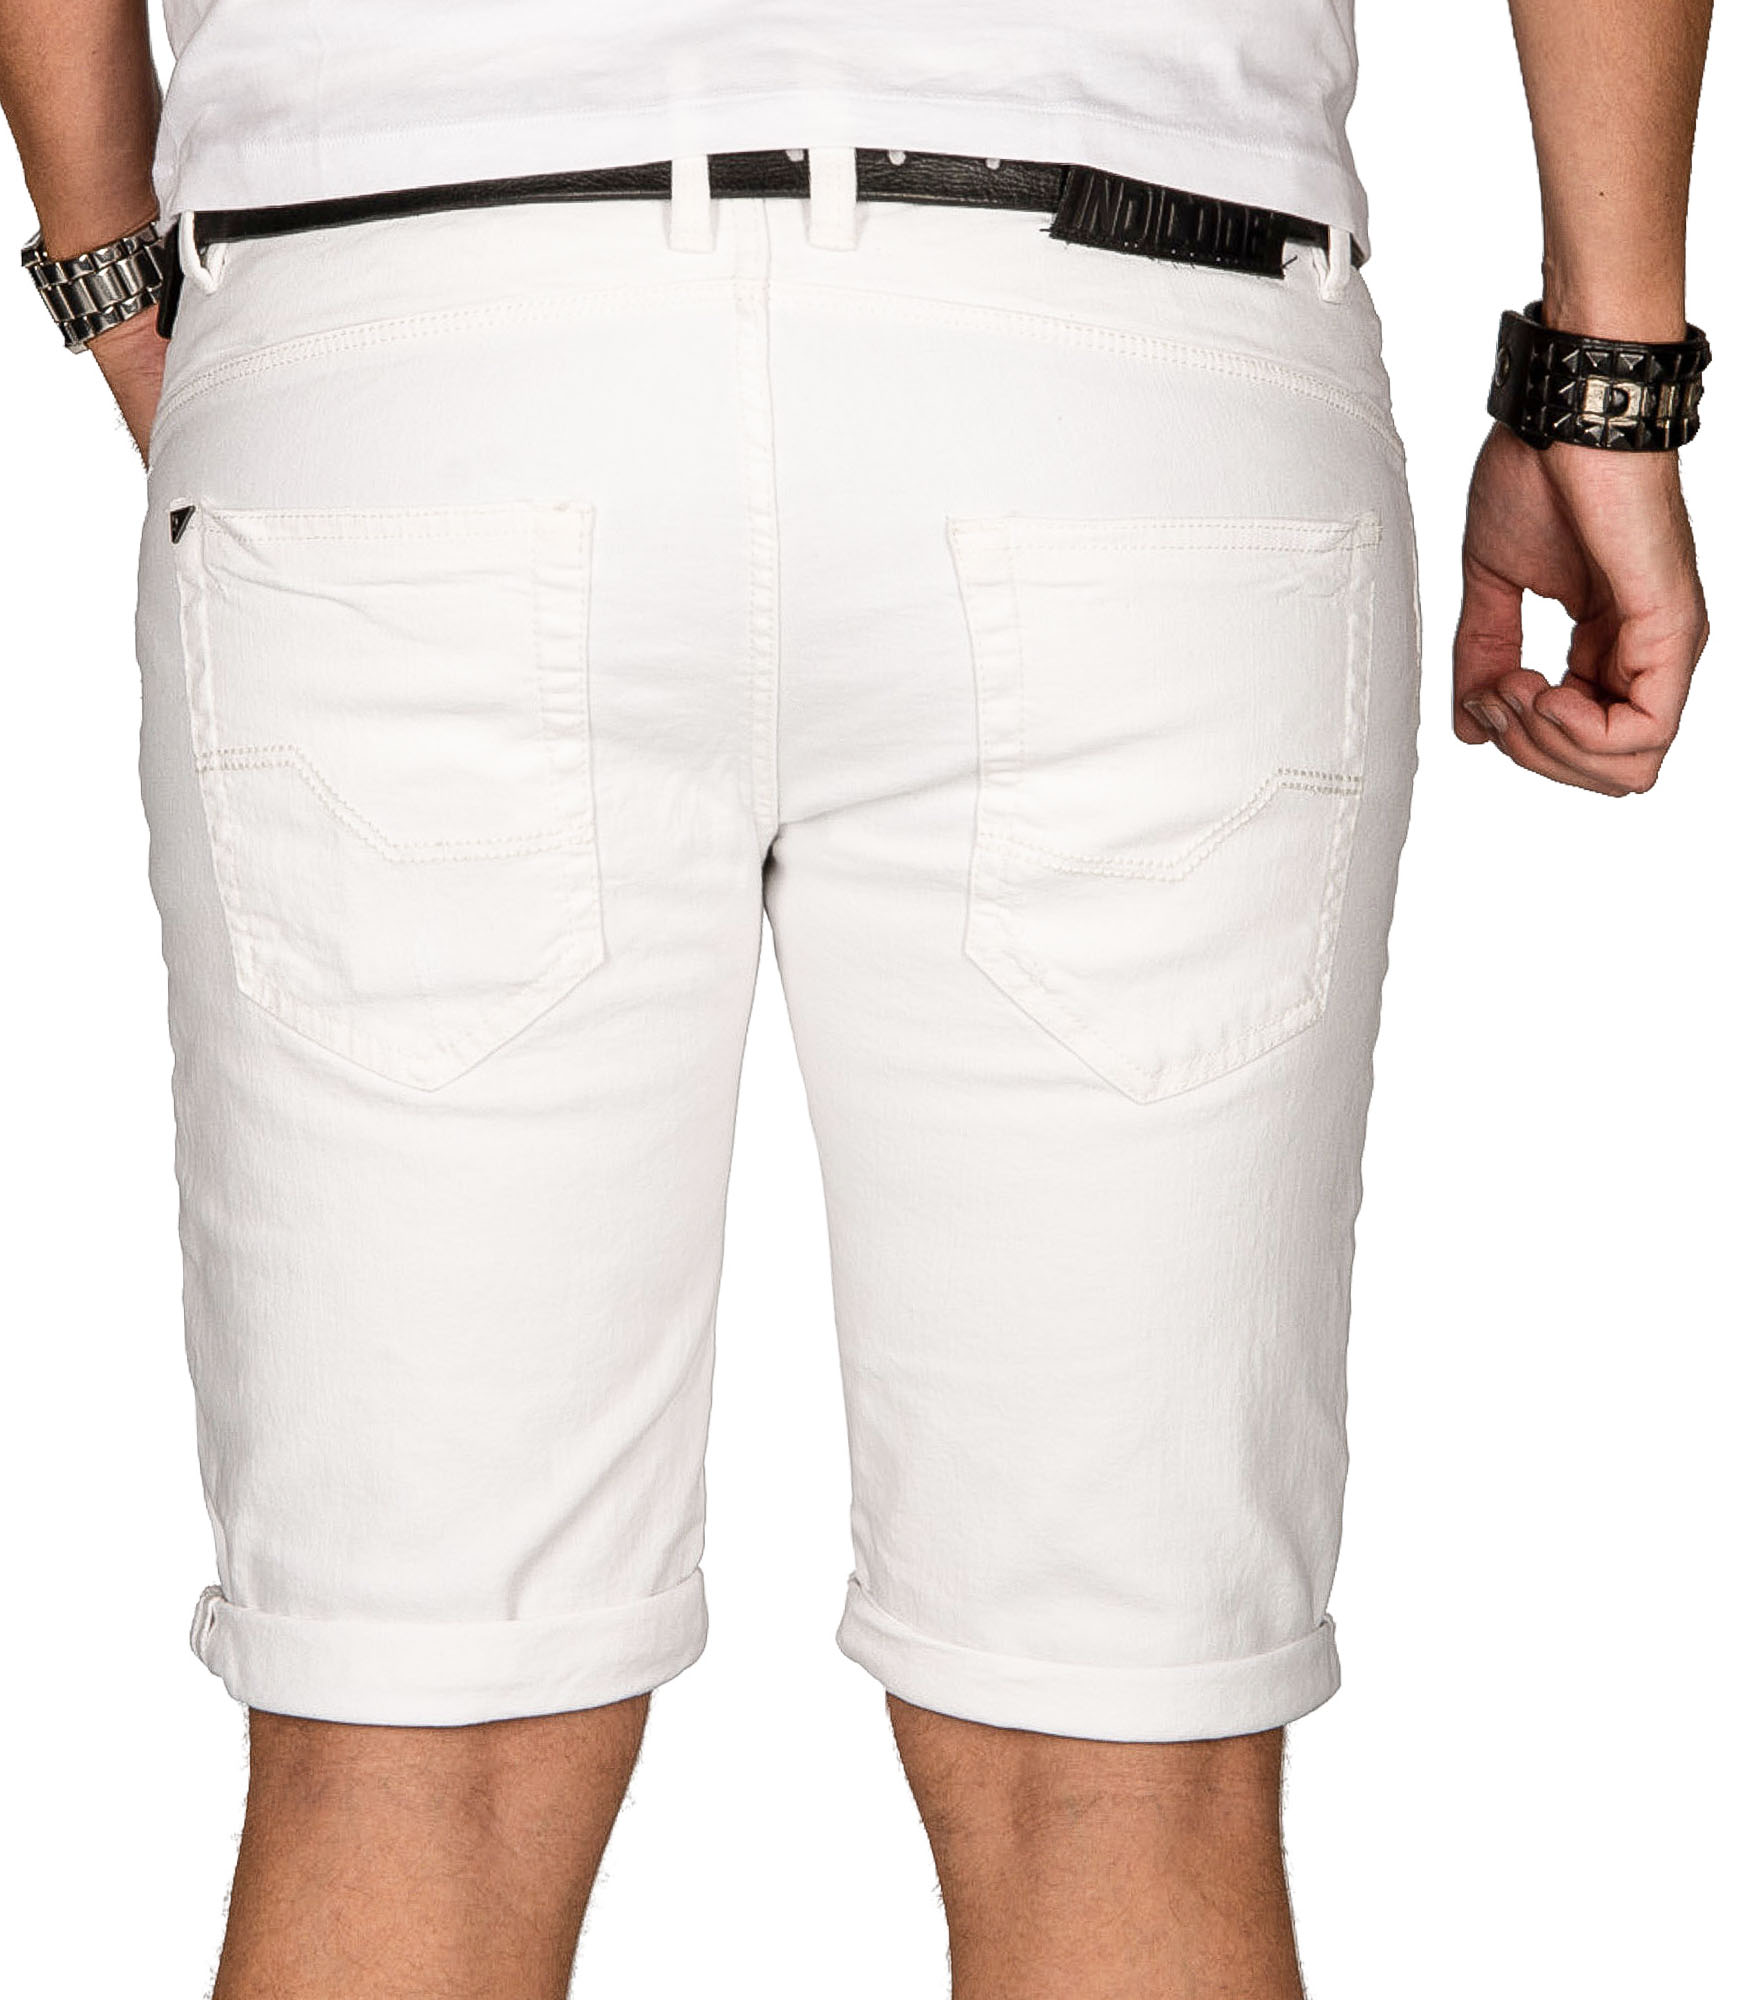 Indicode-Herren-Sommer-Bermuda-Jeans-Shorts-kurze-Hose-Sommerhose-Short-Neu-B556 Indexbild 17